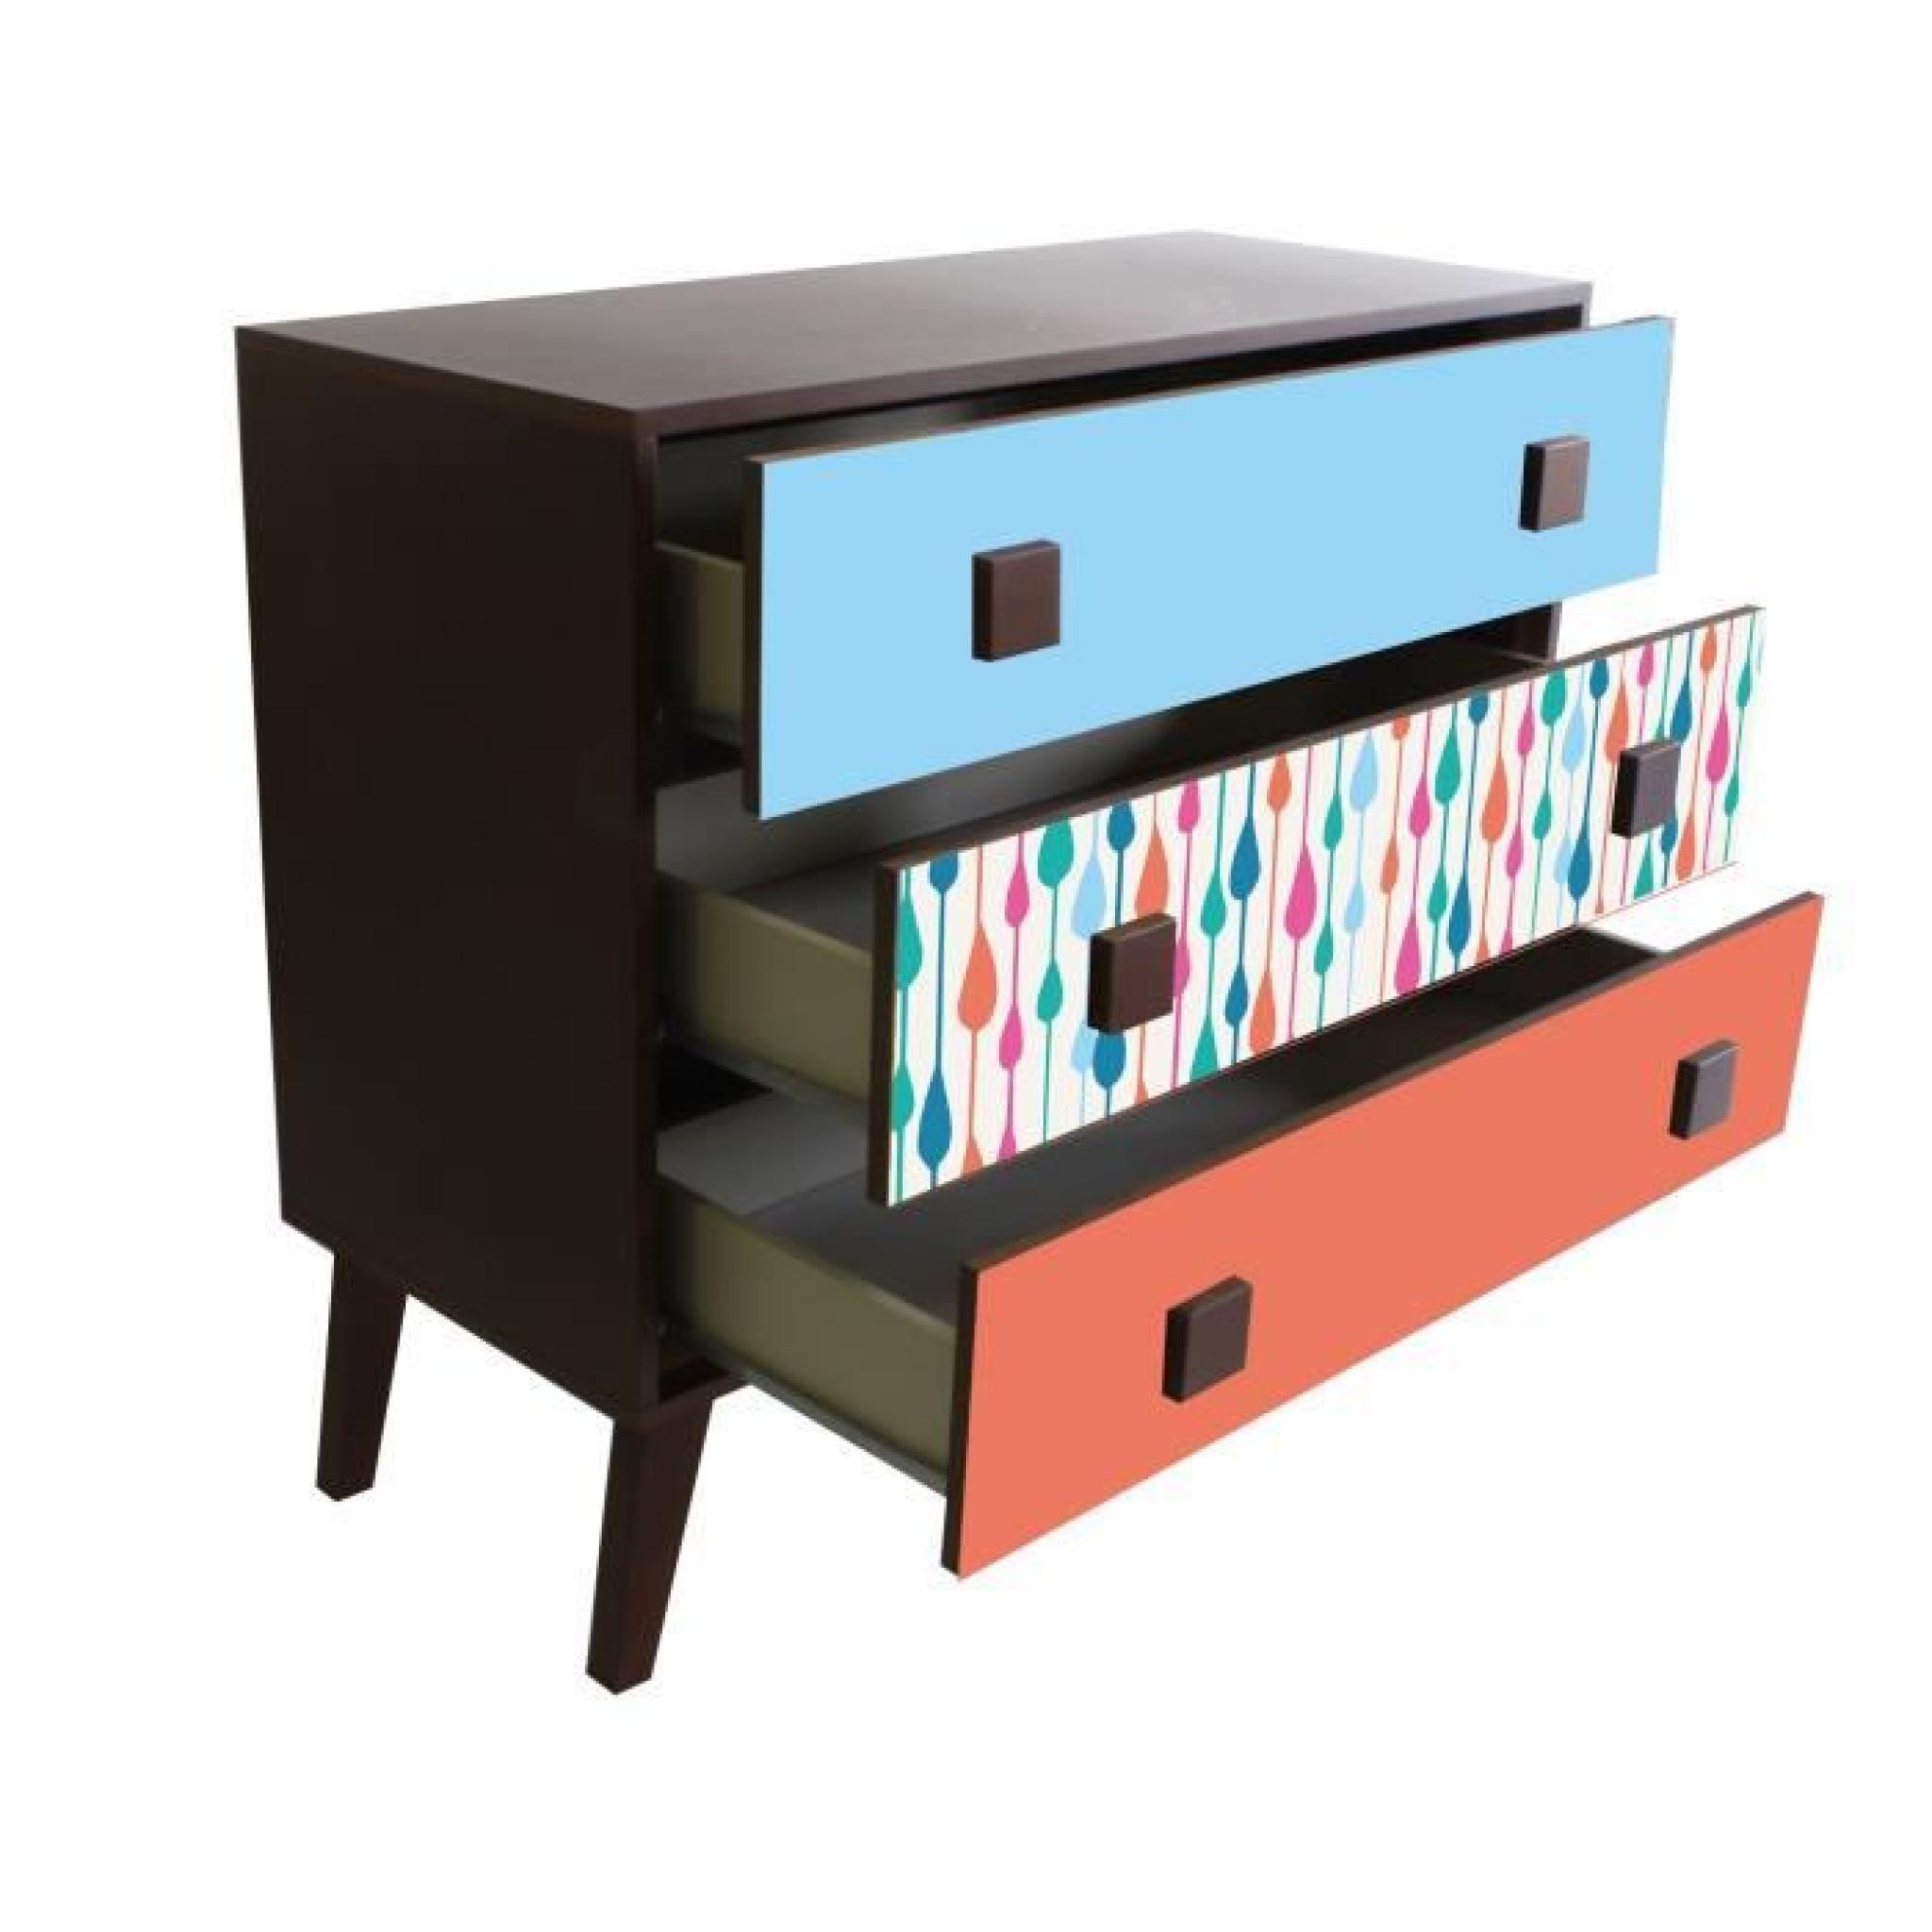 print fifties drop grande commode 3 tiroirs imprim gouttes pastel achat vente commode. Black Bedroom Furniture Sets. Home Design Ideas